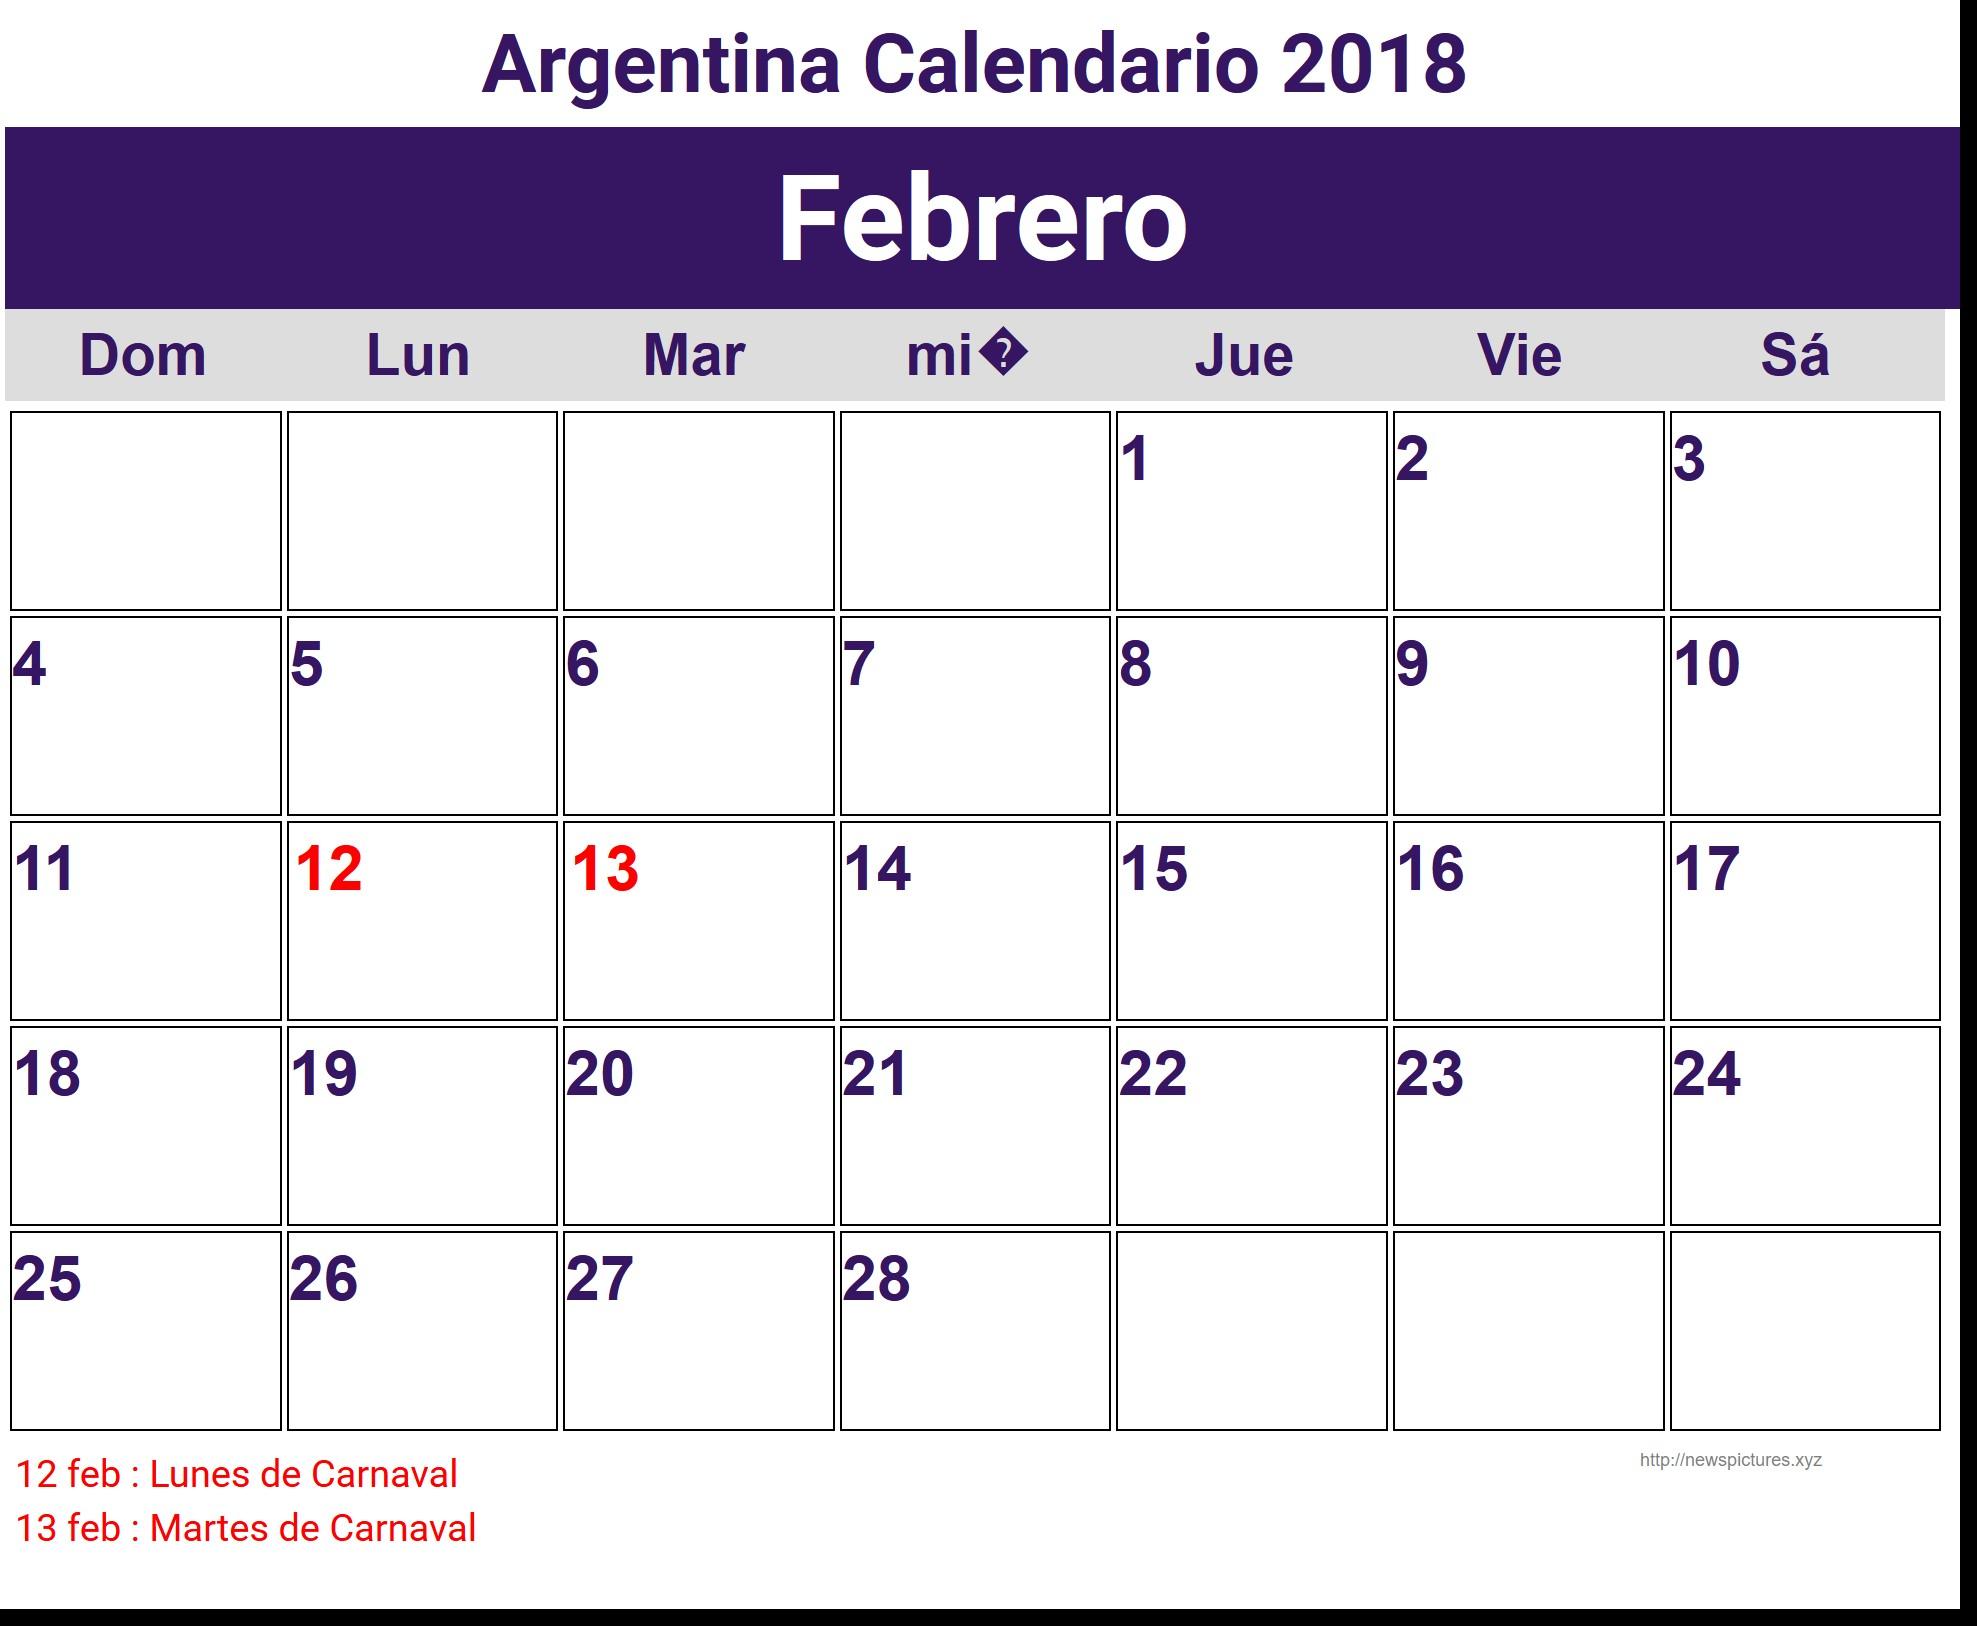 Image for Febrero Argentina Calendario 2018